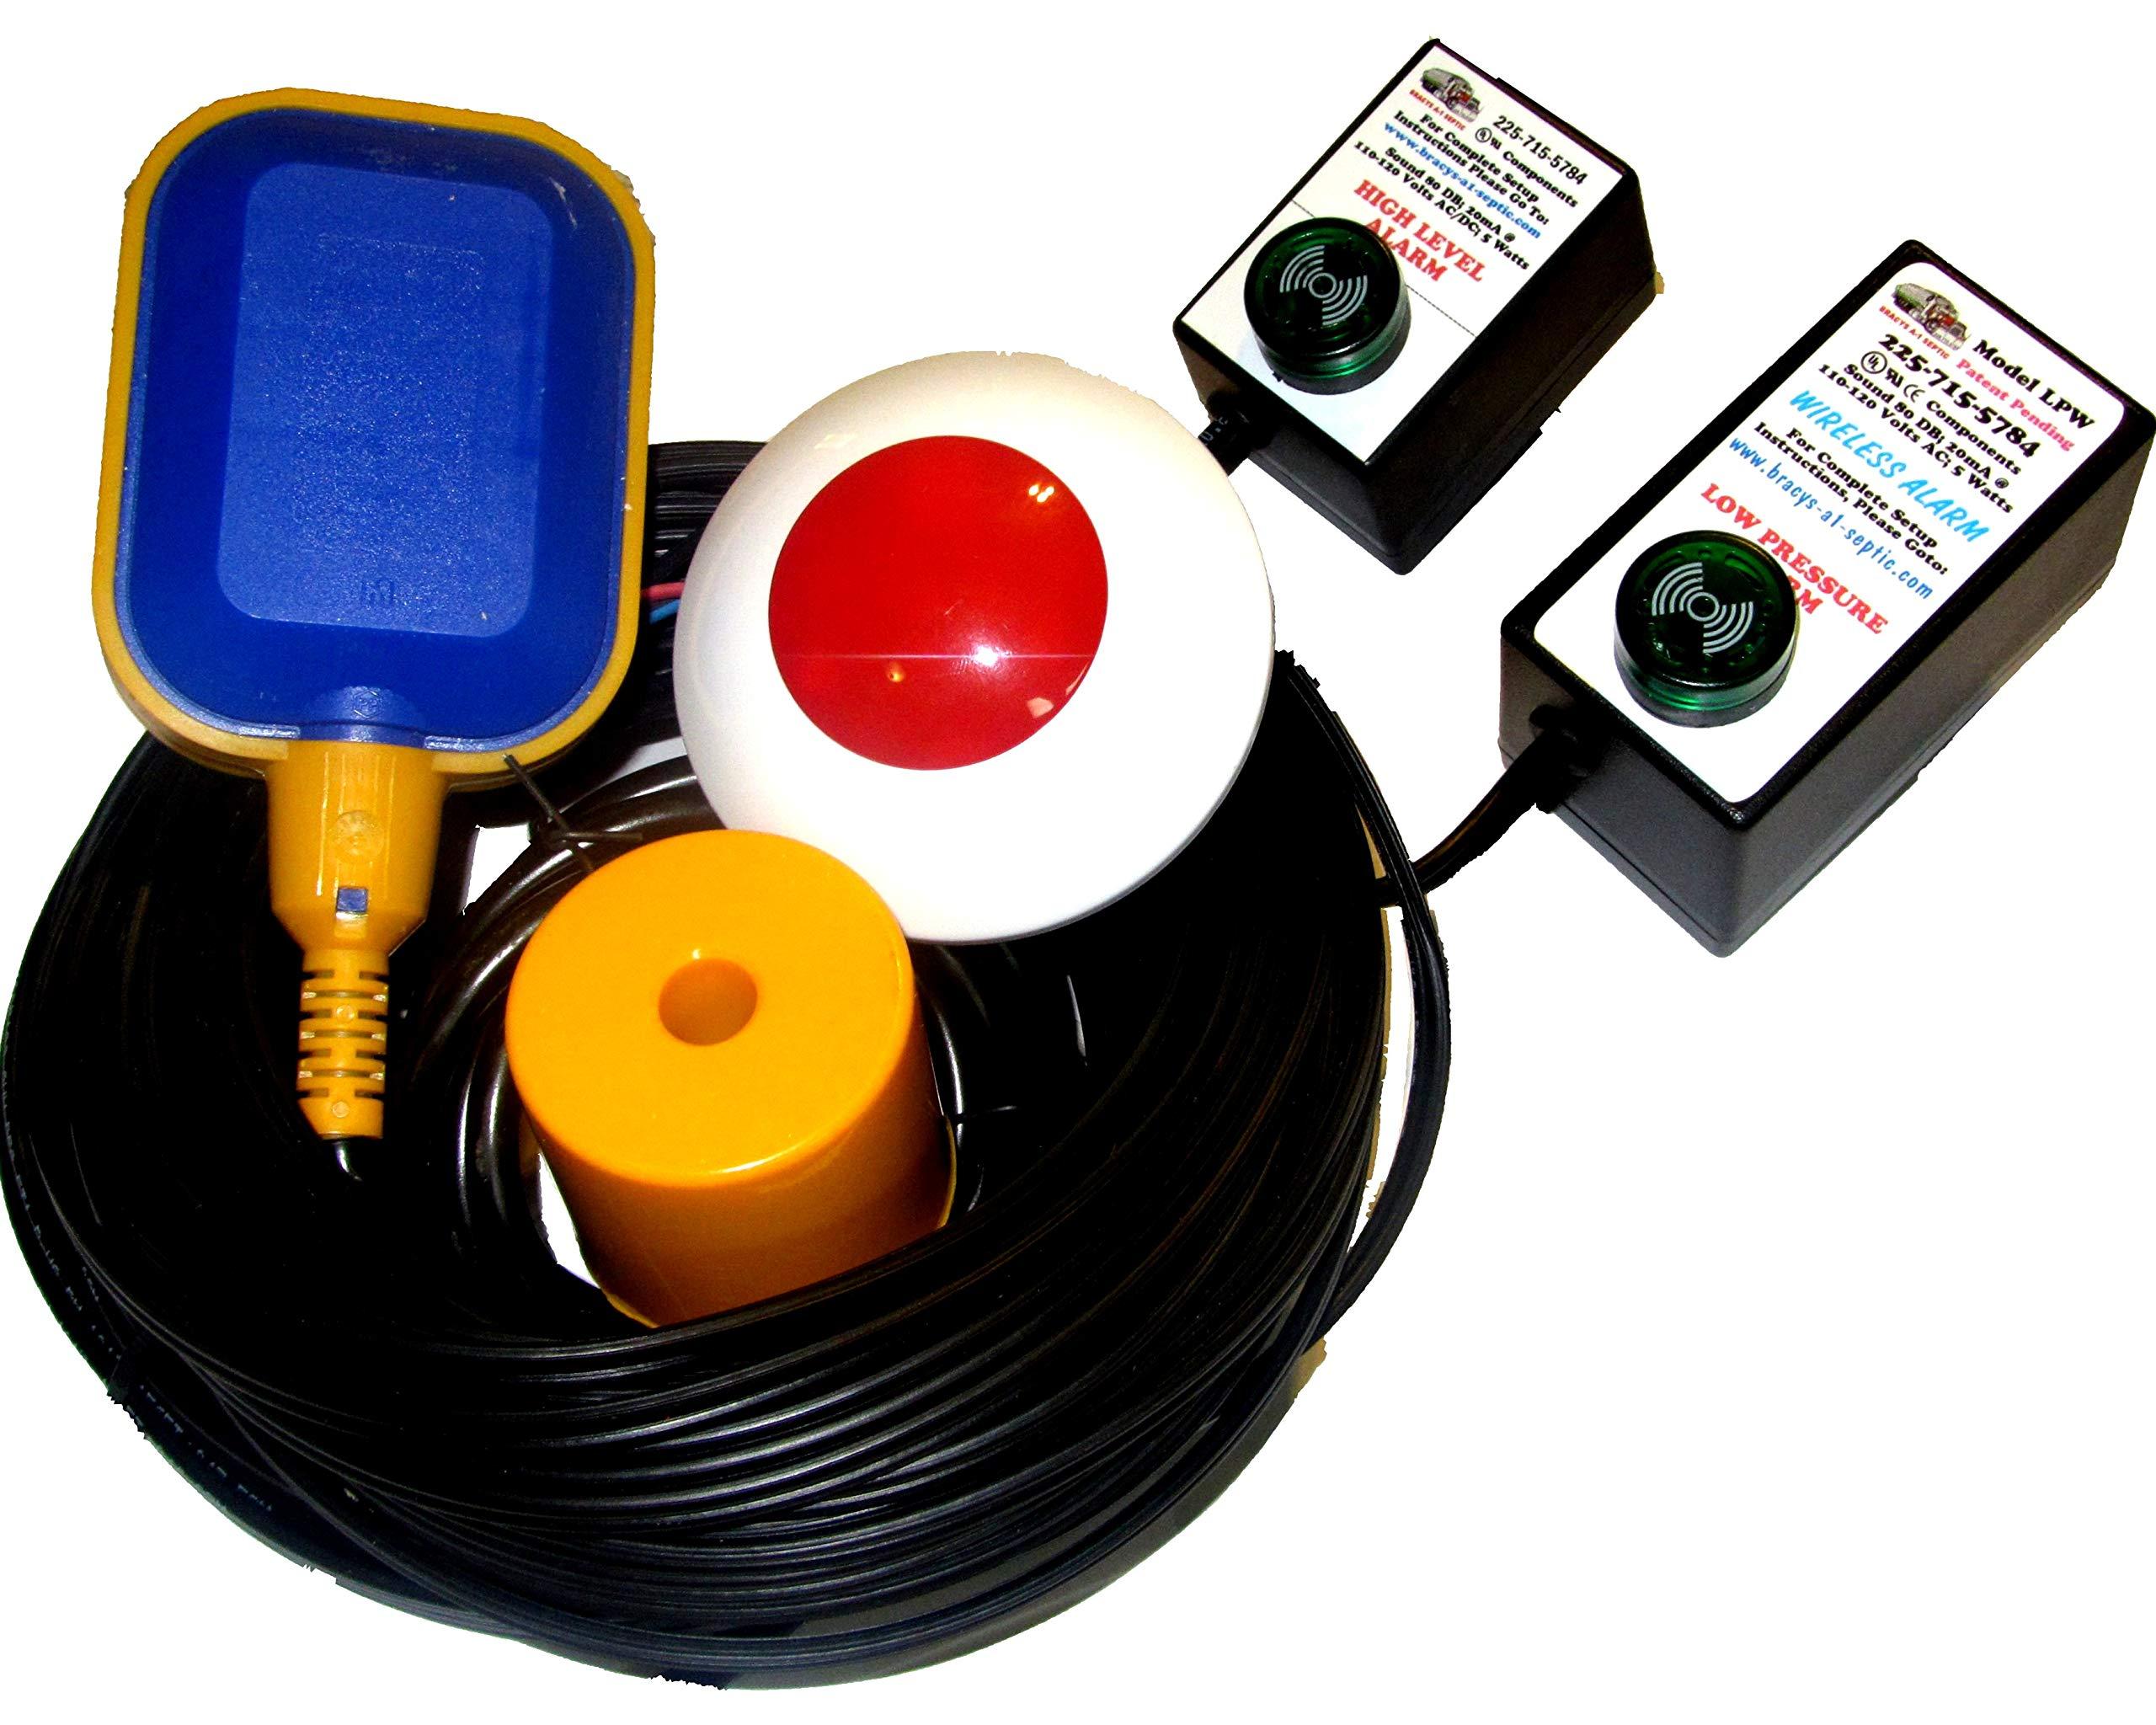 (New Listing) Hi Water Level/Sump Pump Failure Alarm (Standard & Wireless) by Bracys A-1 Septic (Image #2)